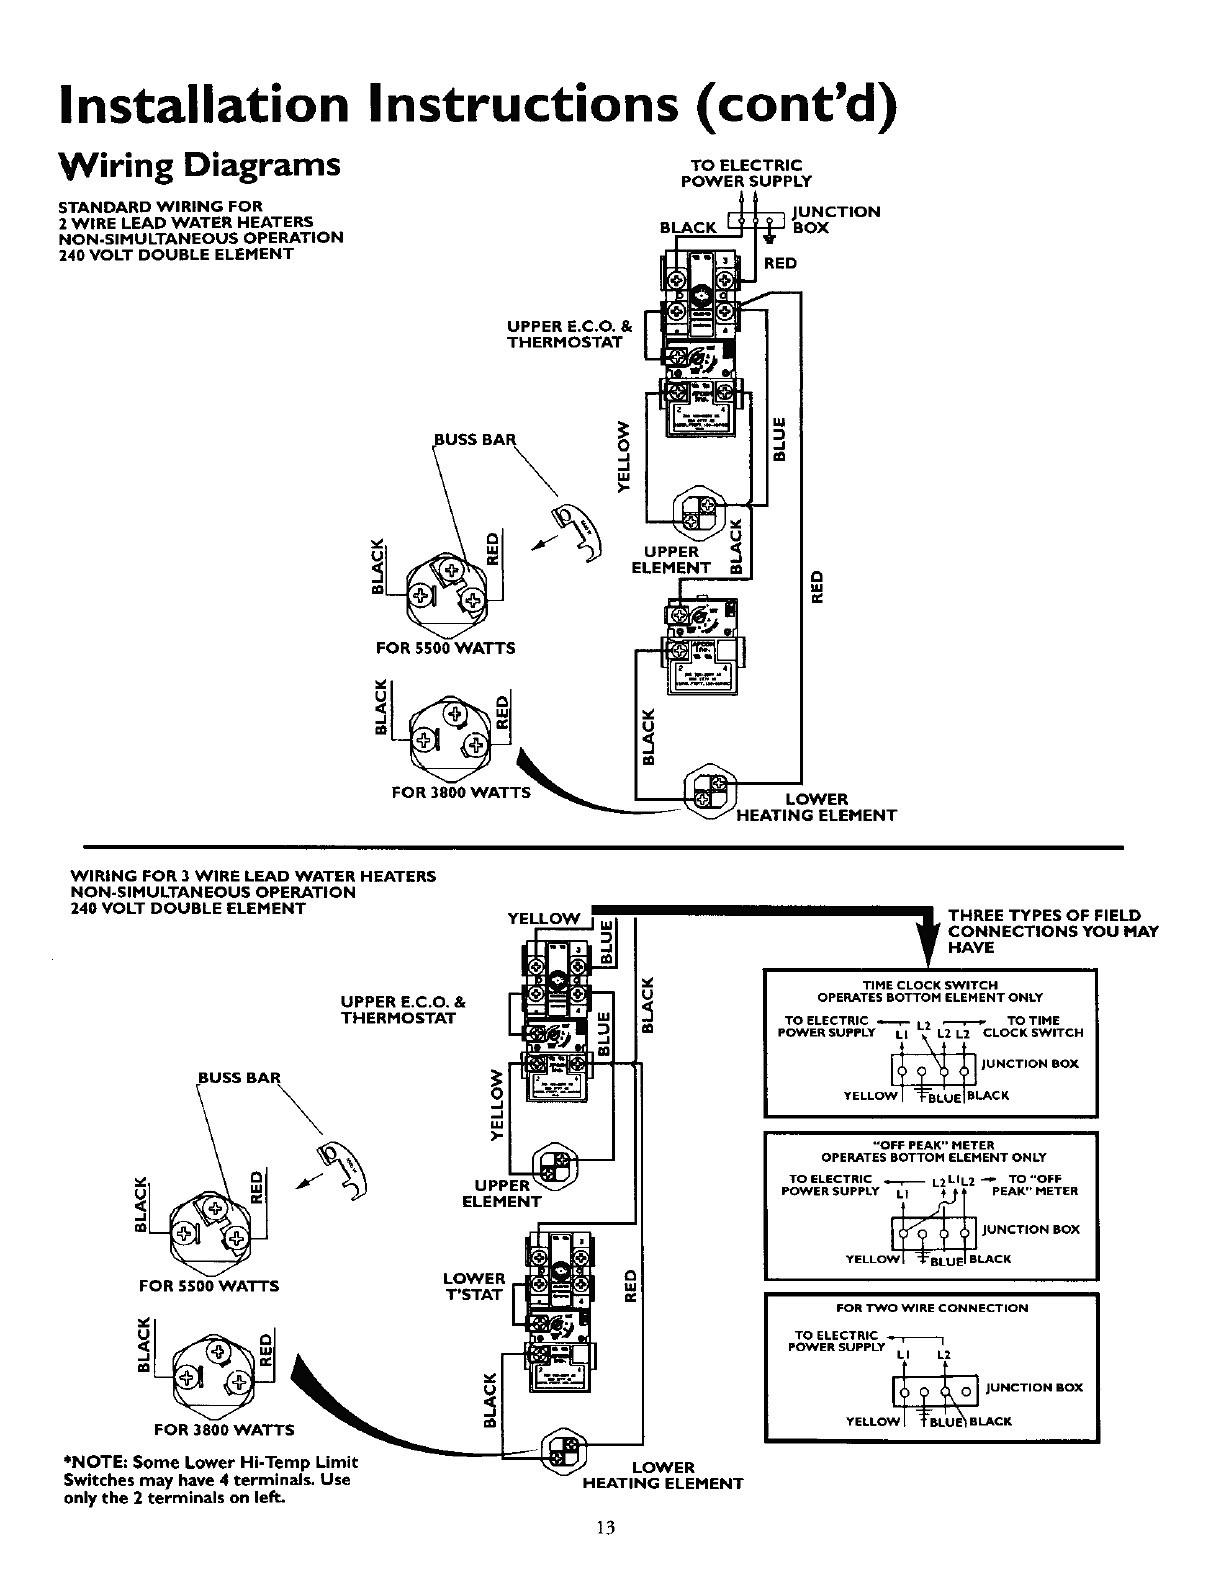 geyser timer wiring diagram 3 gang way light switch atwood water heater free